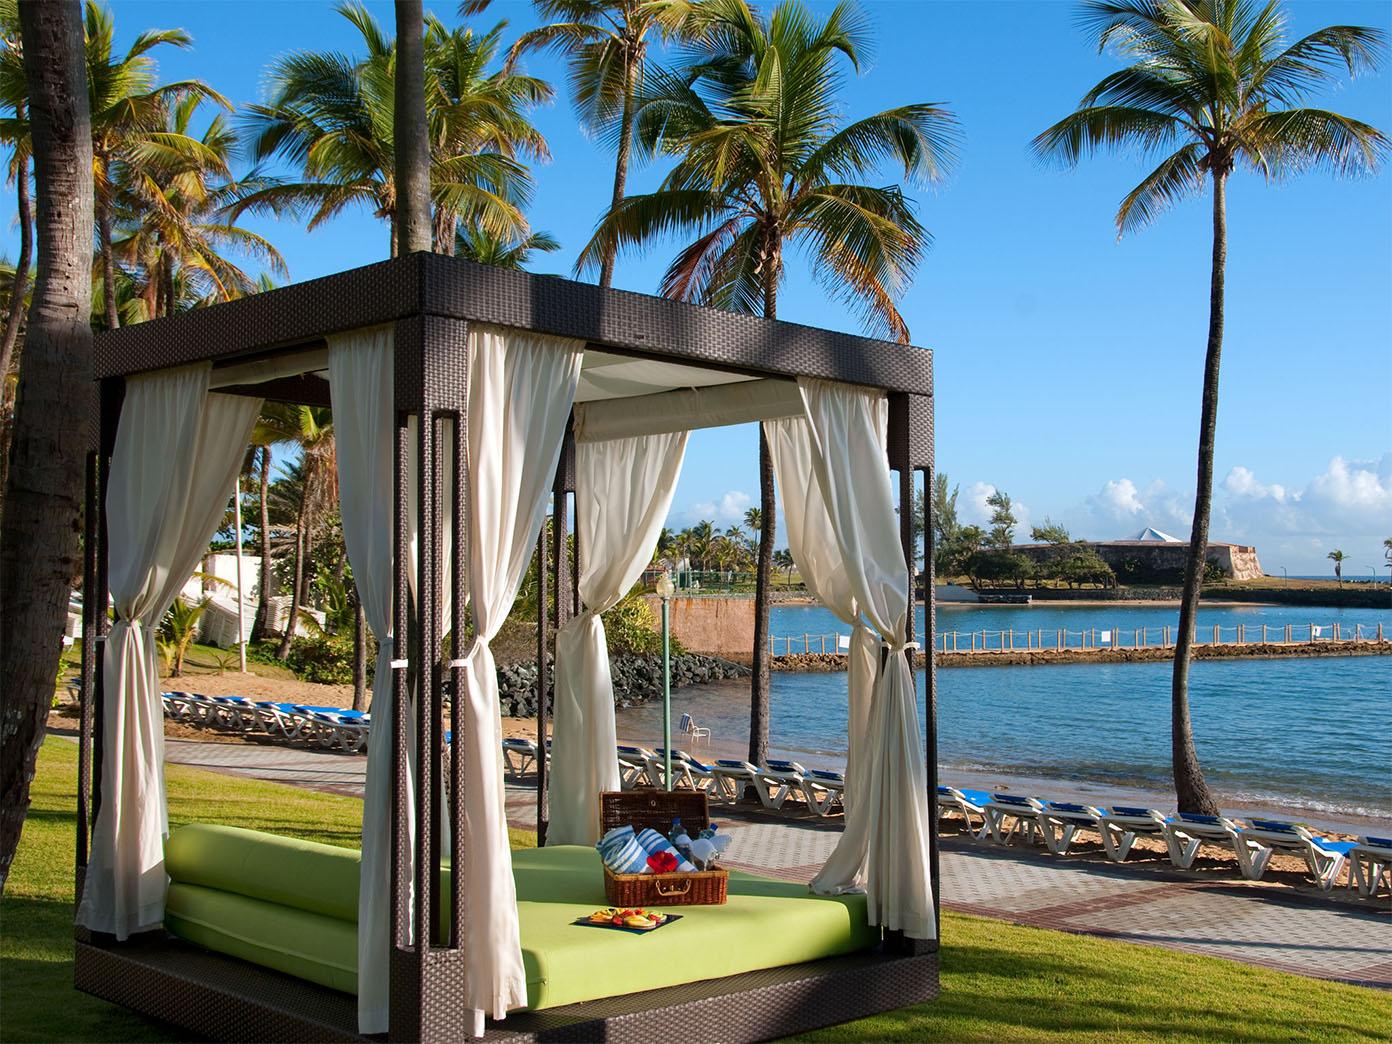 Caribe Hilton San Juan Beach Cabana